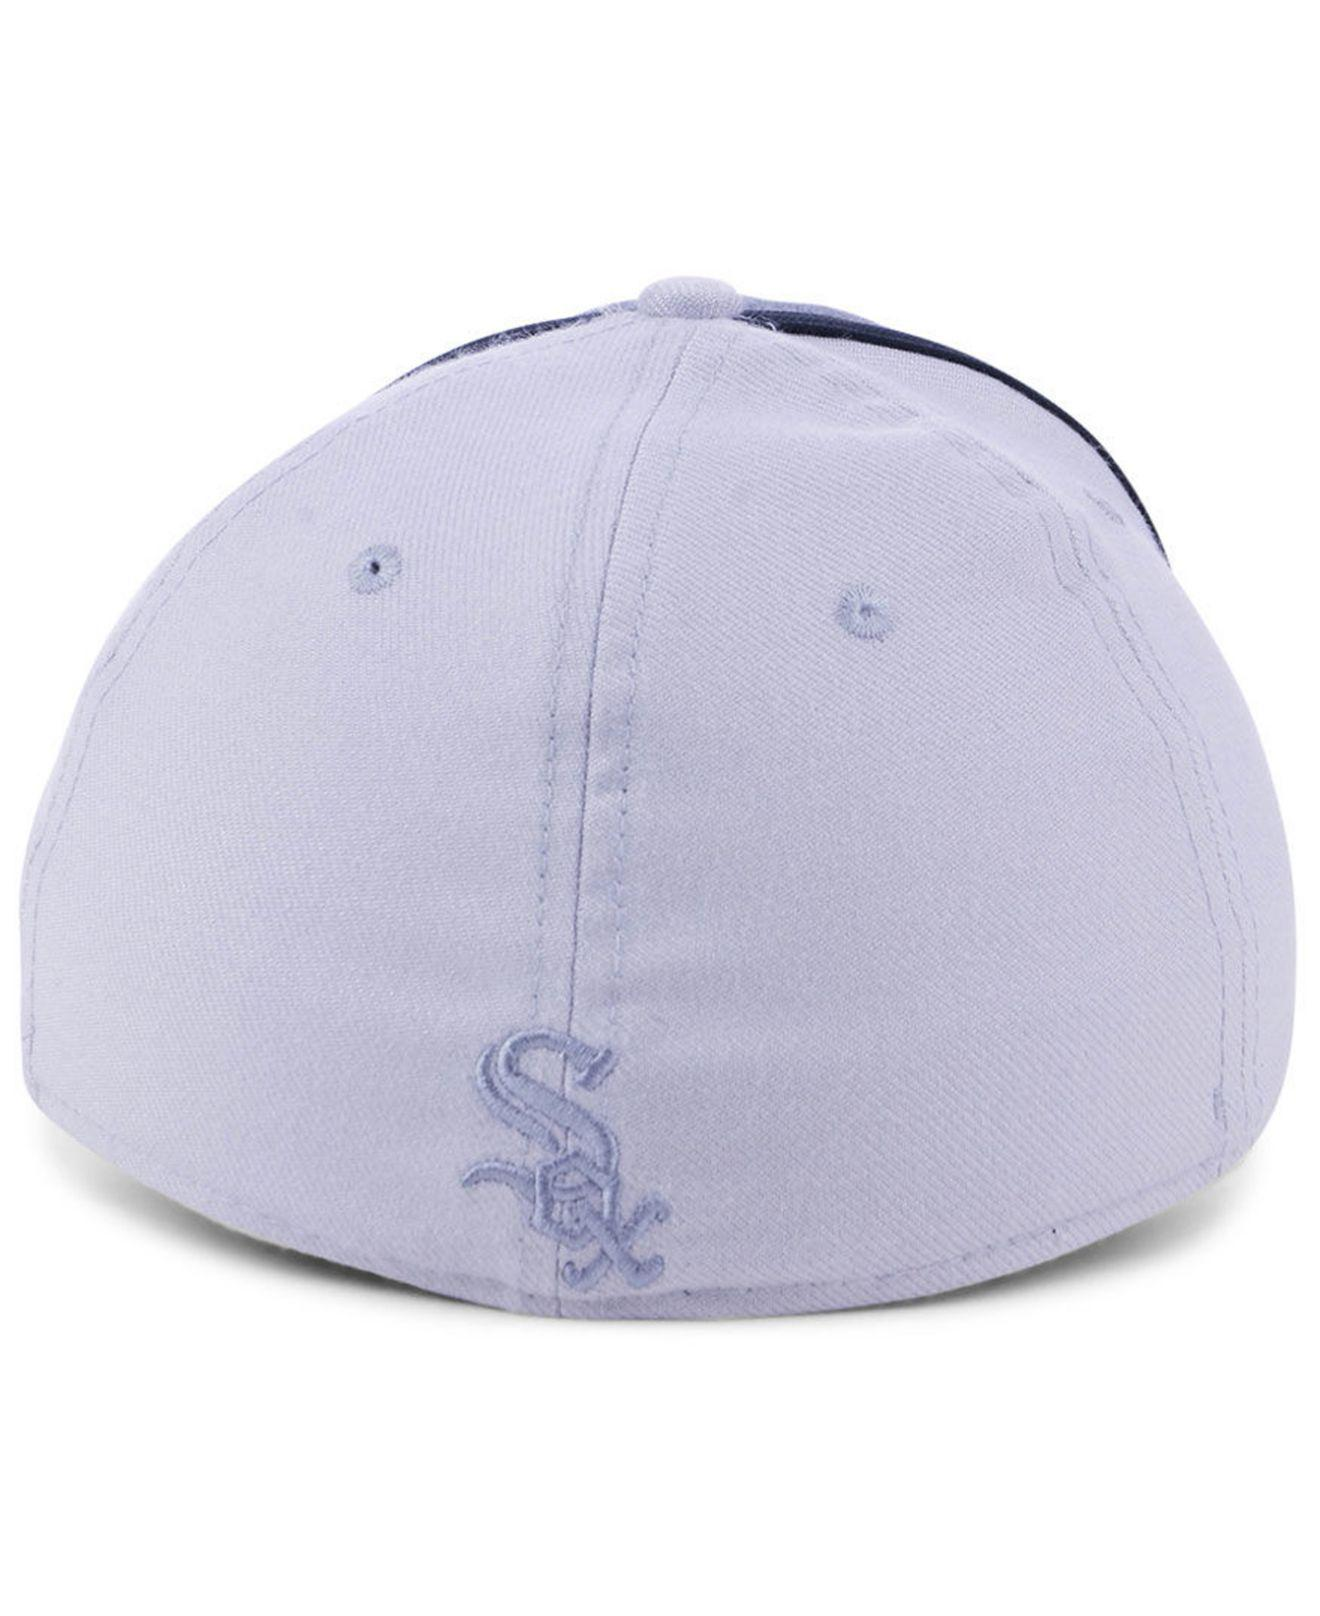 wholesale dealer f6387 975db ... france mlb classic swooshflex cap 100 authentic 85035 98f9a lyst nike  chicago white sox team color